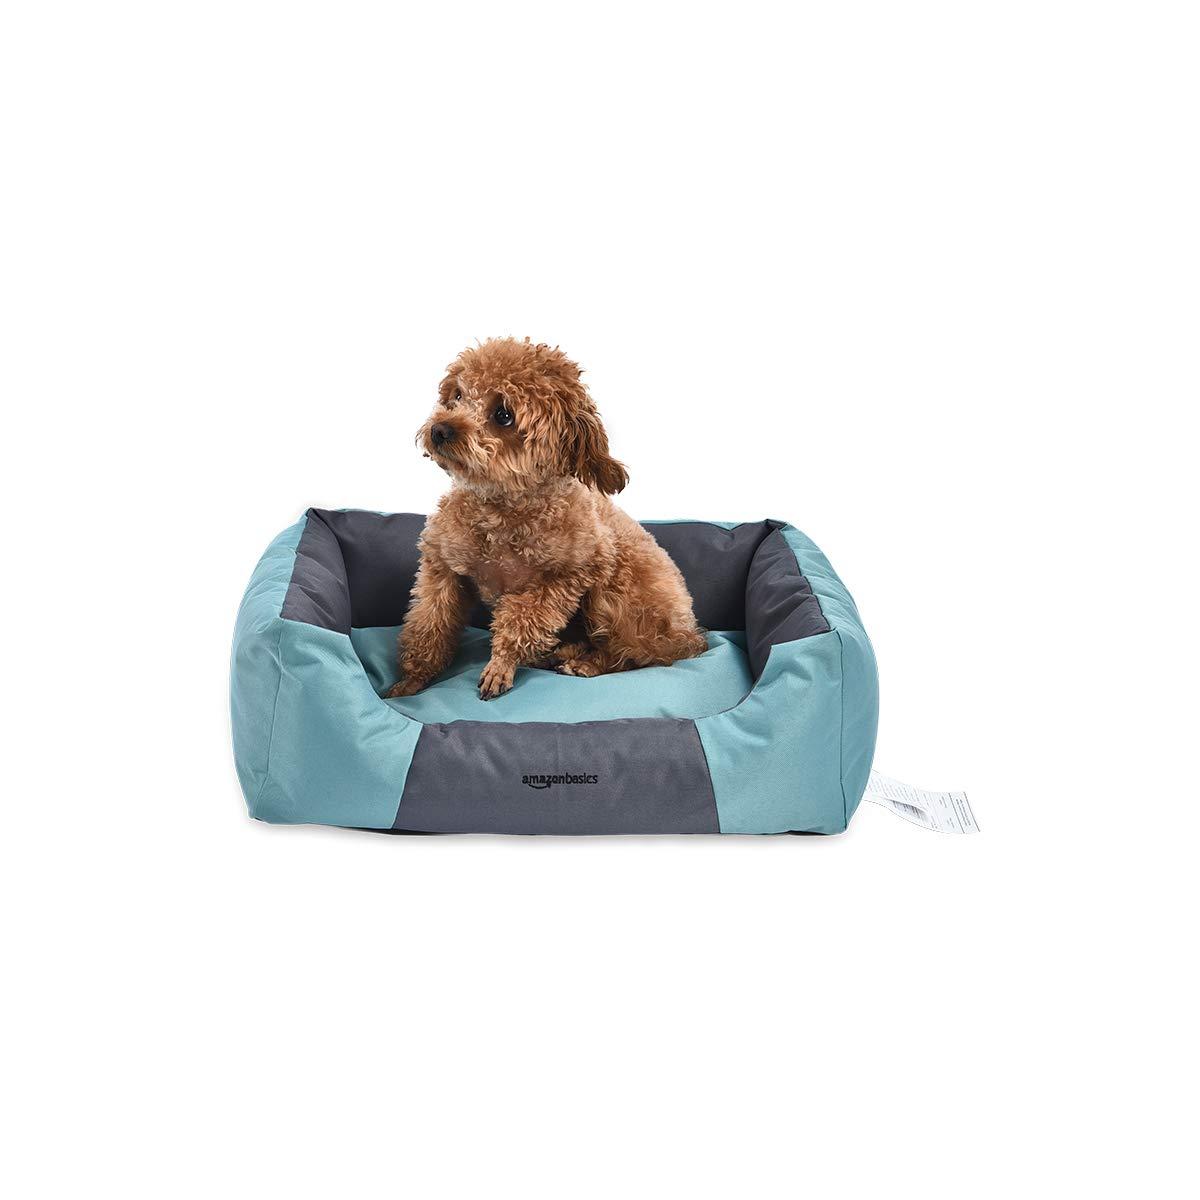 AmazonBasics Water Resistant Pet Bed Rectangular